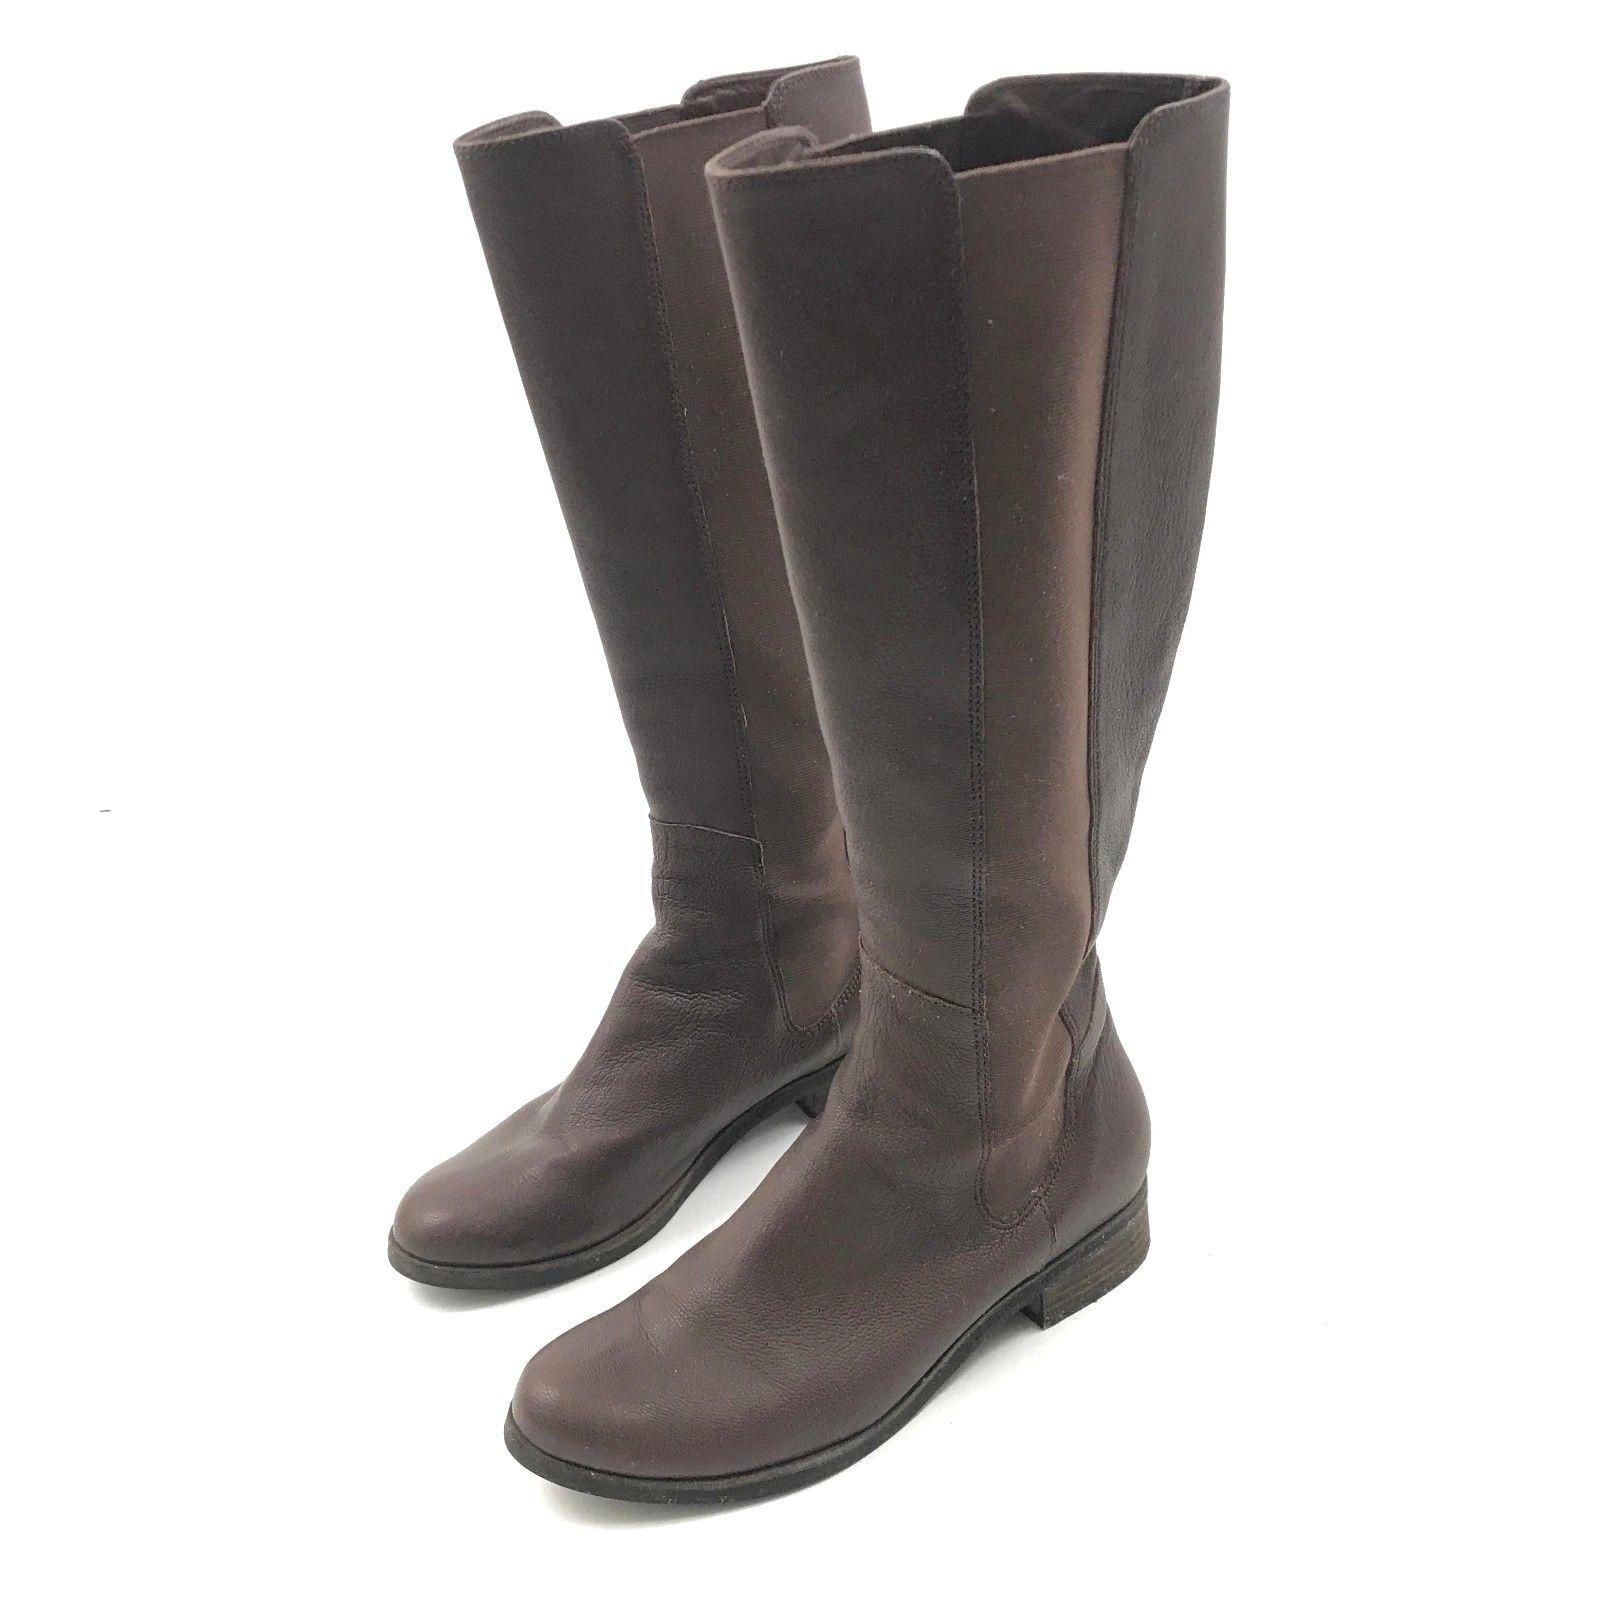 39013eb7bc9 Cole HAAN Kniehohe Stiefel Damen 9.5 Braun Leder Stretch Seiten Gestapelt  Absatz -  54.51 · Advanced search for Cole Haan Nike Air Boot